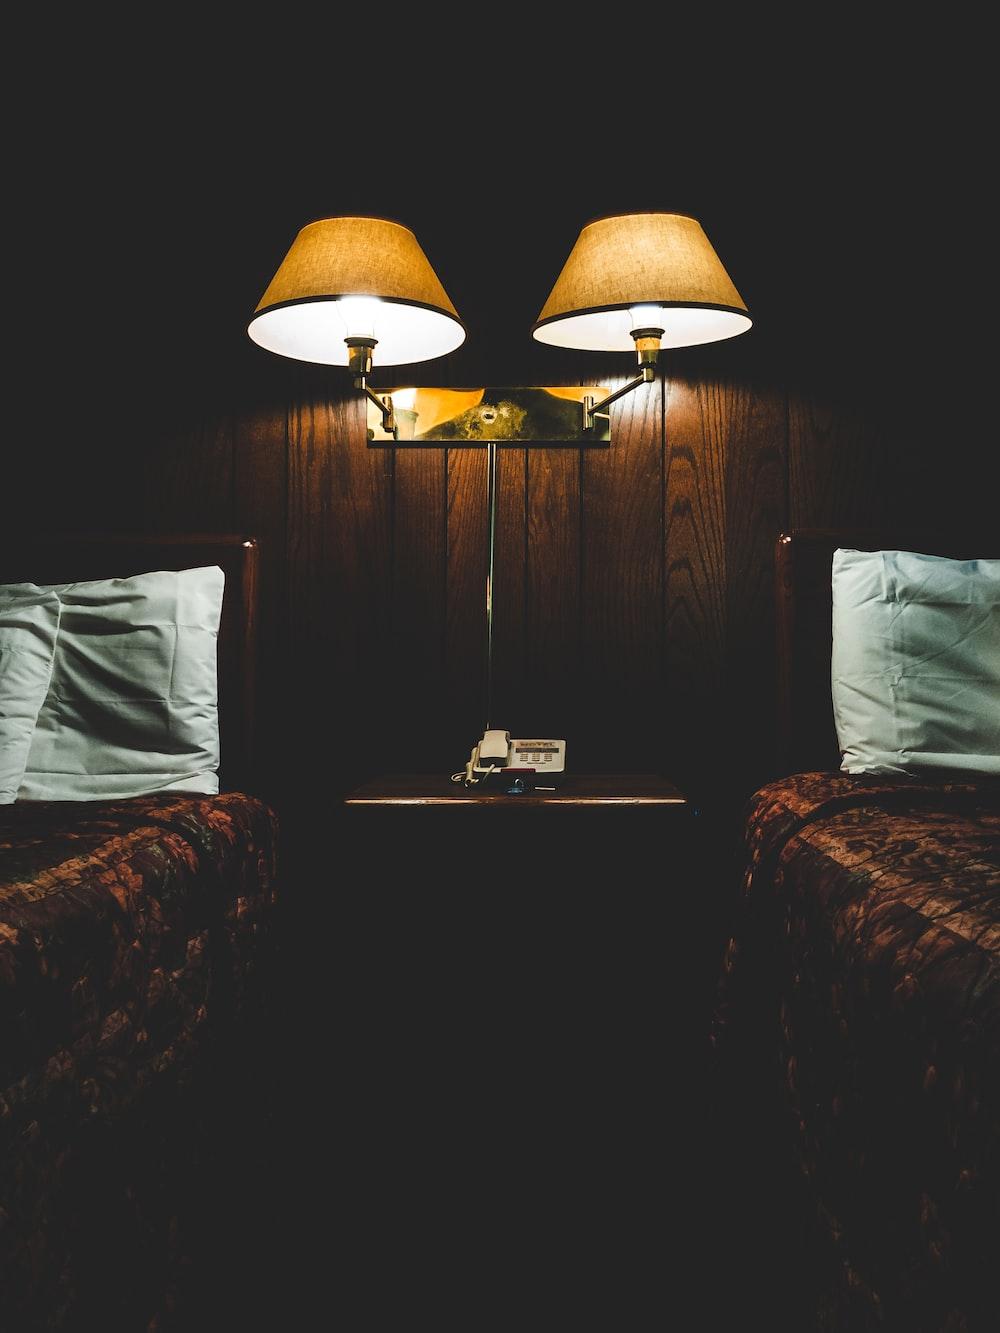 wall lamp in between of beds